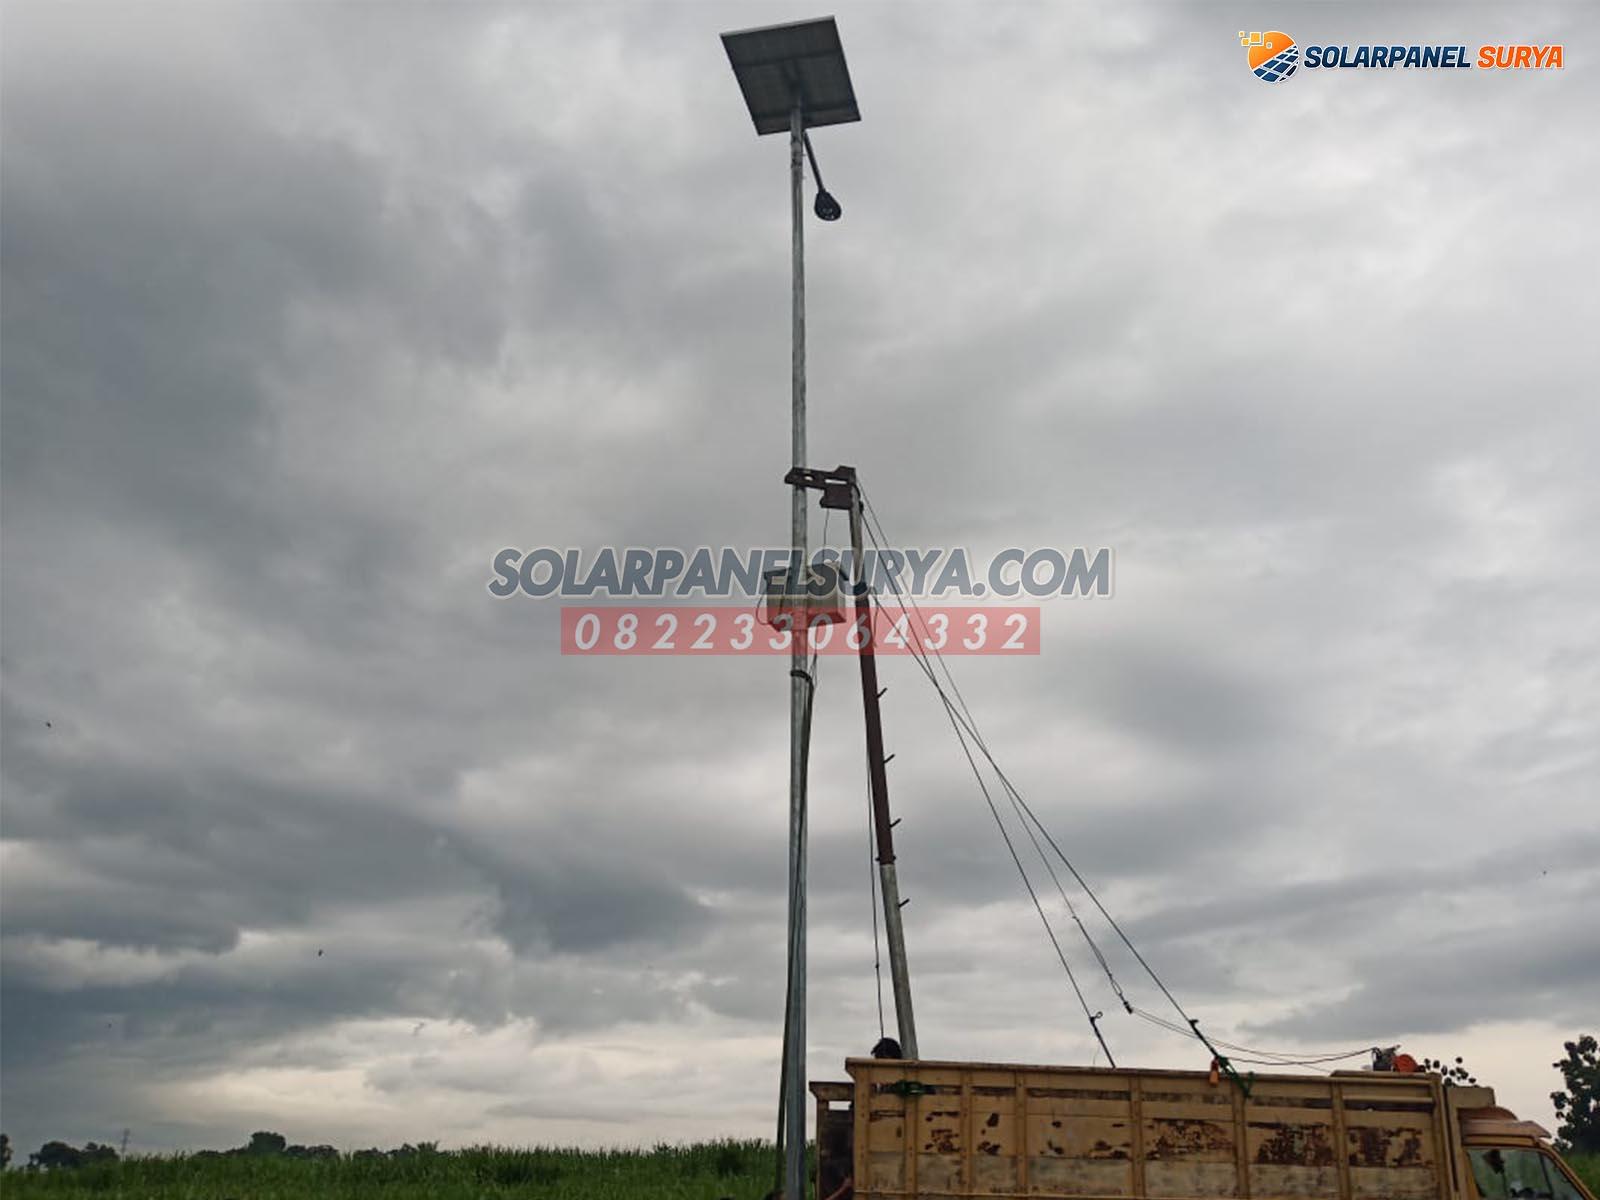 daftar harga paket lampu jalan tenaga surya denpasar bali satu set